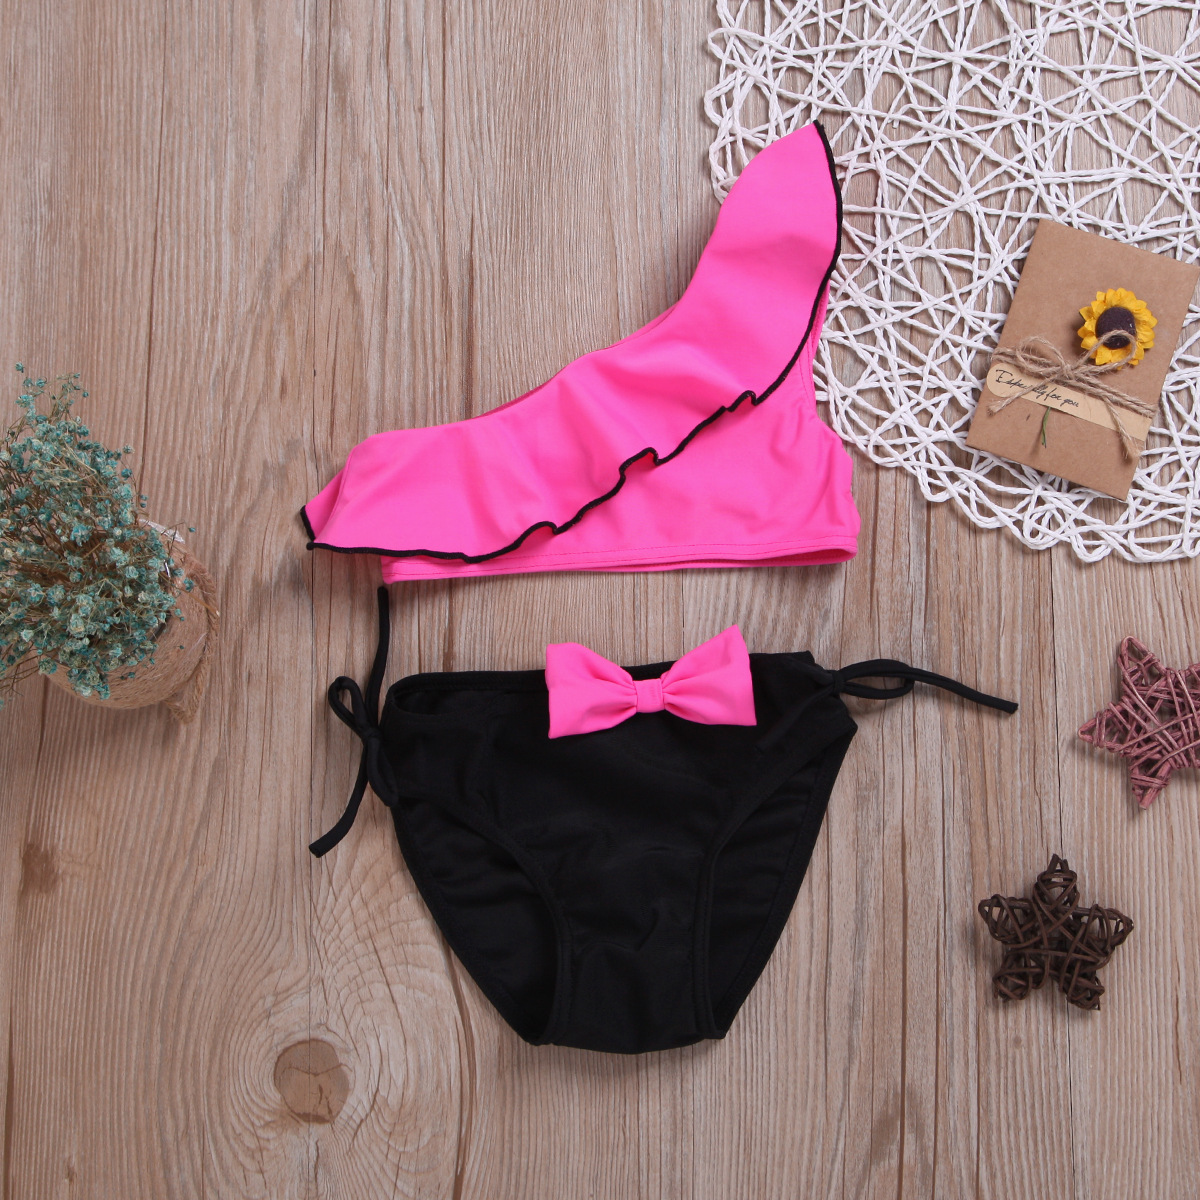 2019 New Style Kid's Swimwear Girls Sloping Shoulder Bathing Suit Girl's Split Type Swimwear Multi-color Selectable